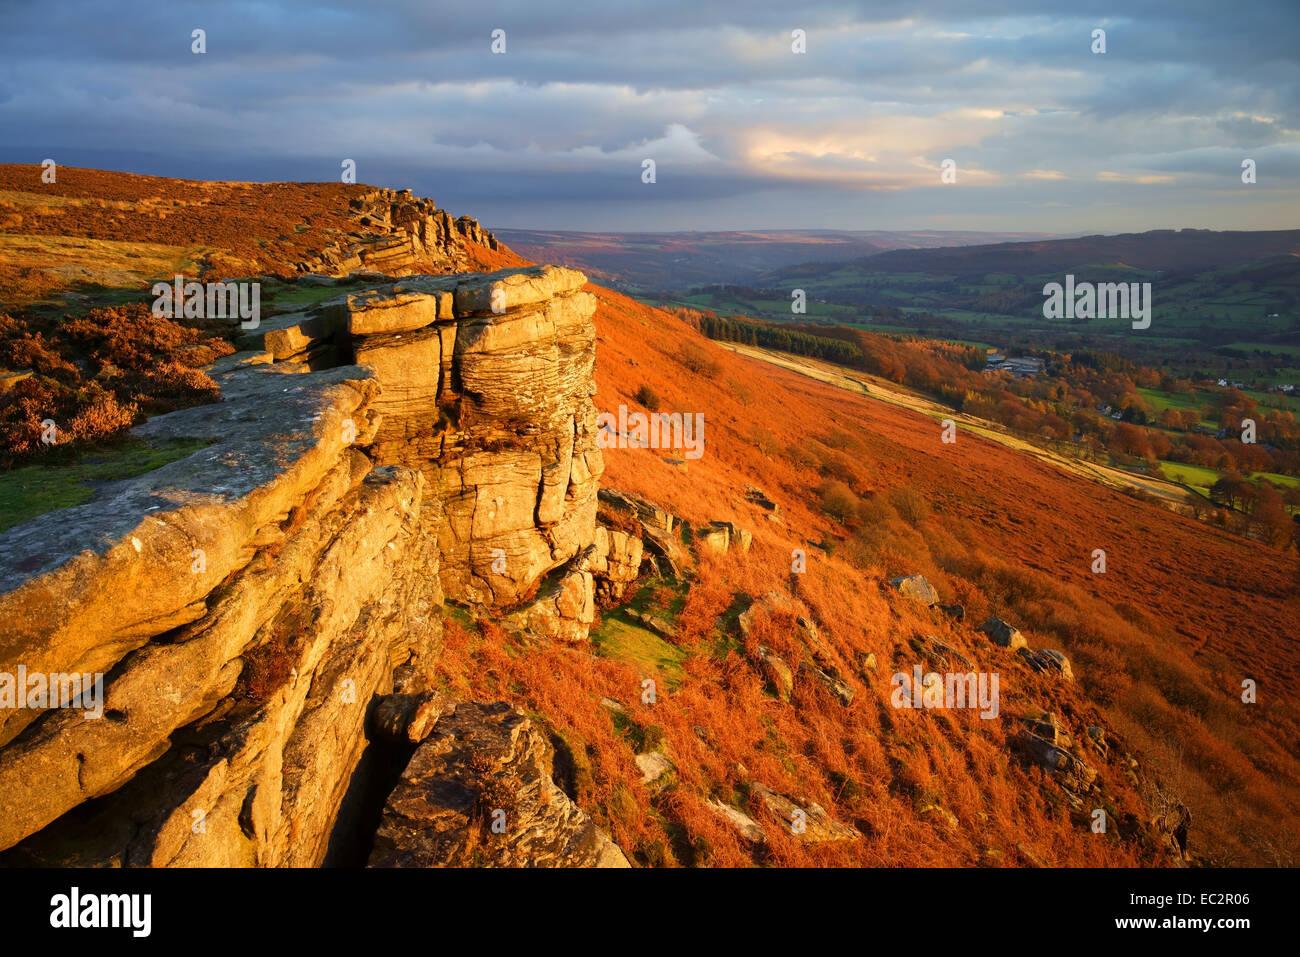 UK,Derbyshire,Peak District, Bamford Edge - Stock Image